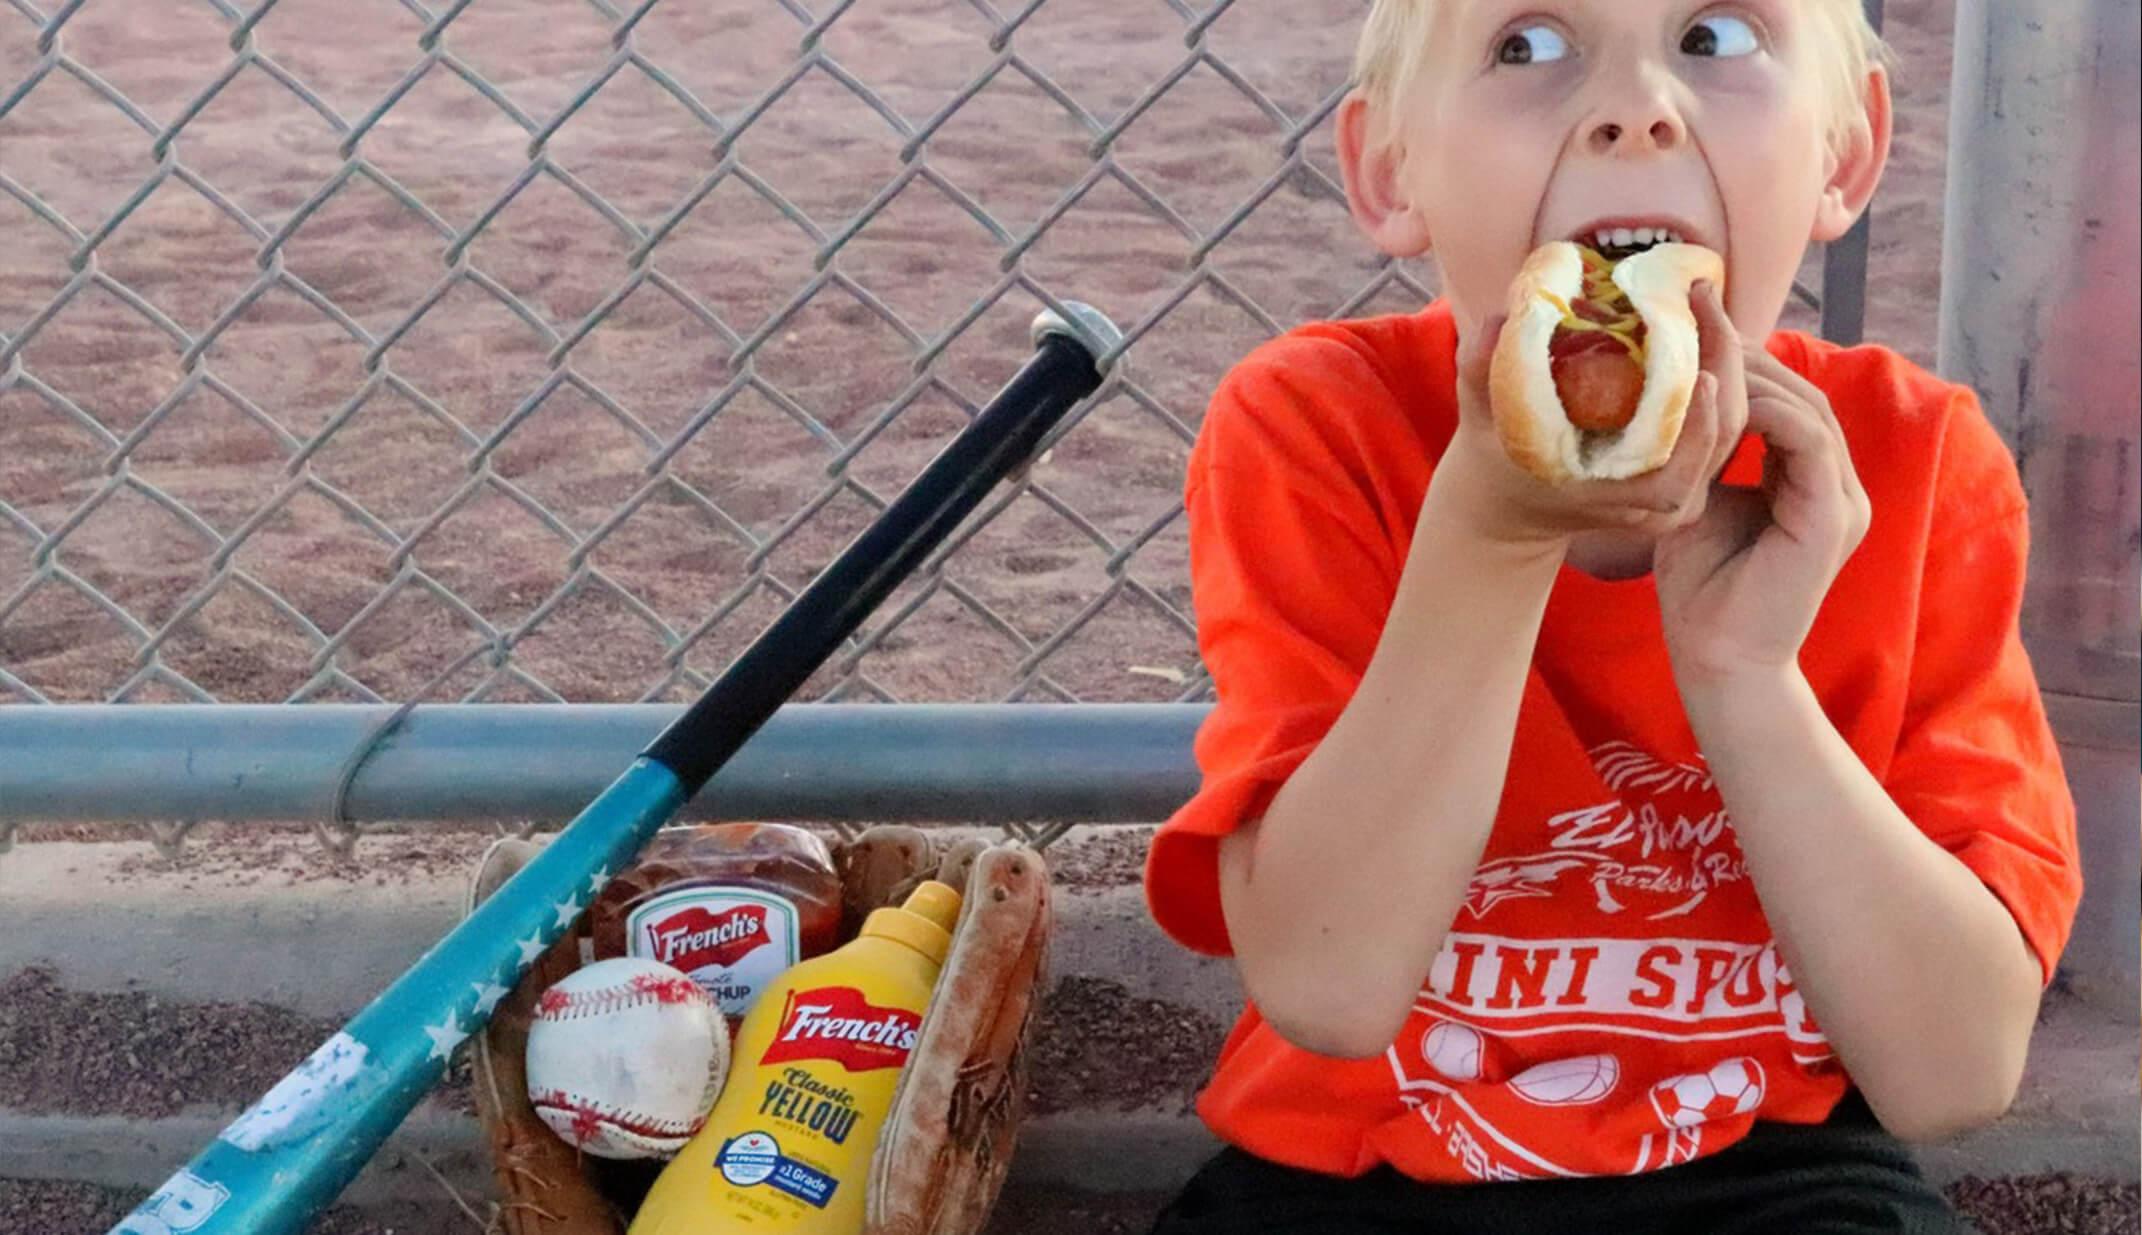 funny kid eating hot-dog baseball bat funny pic UGC content